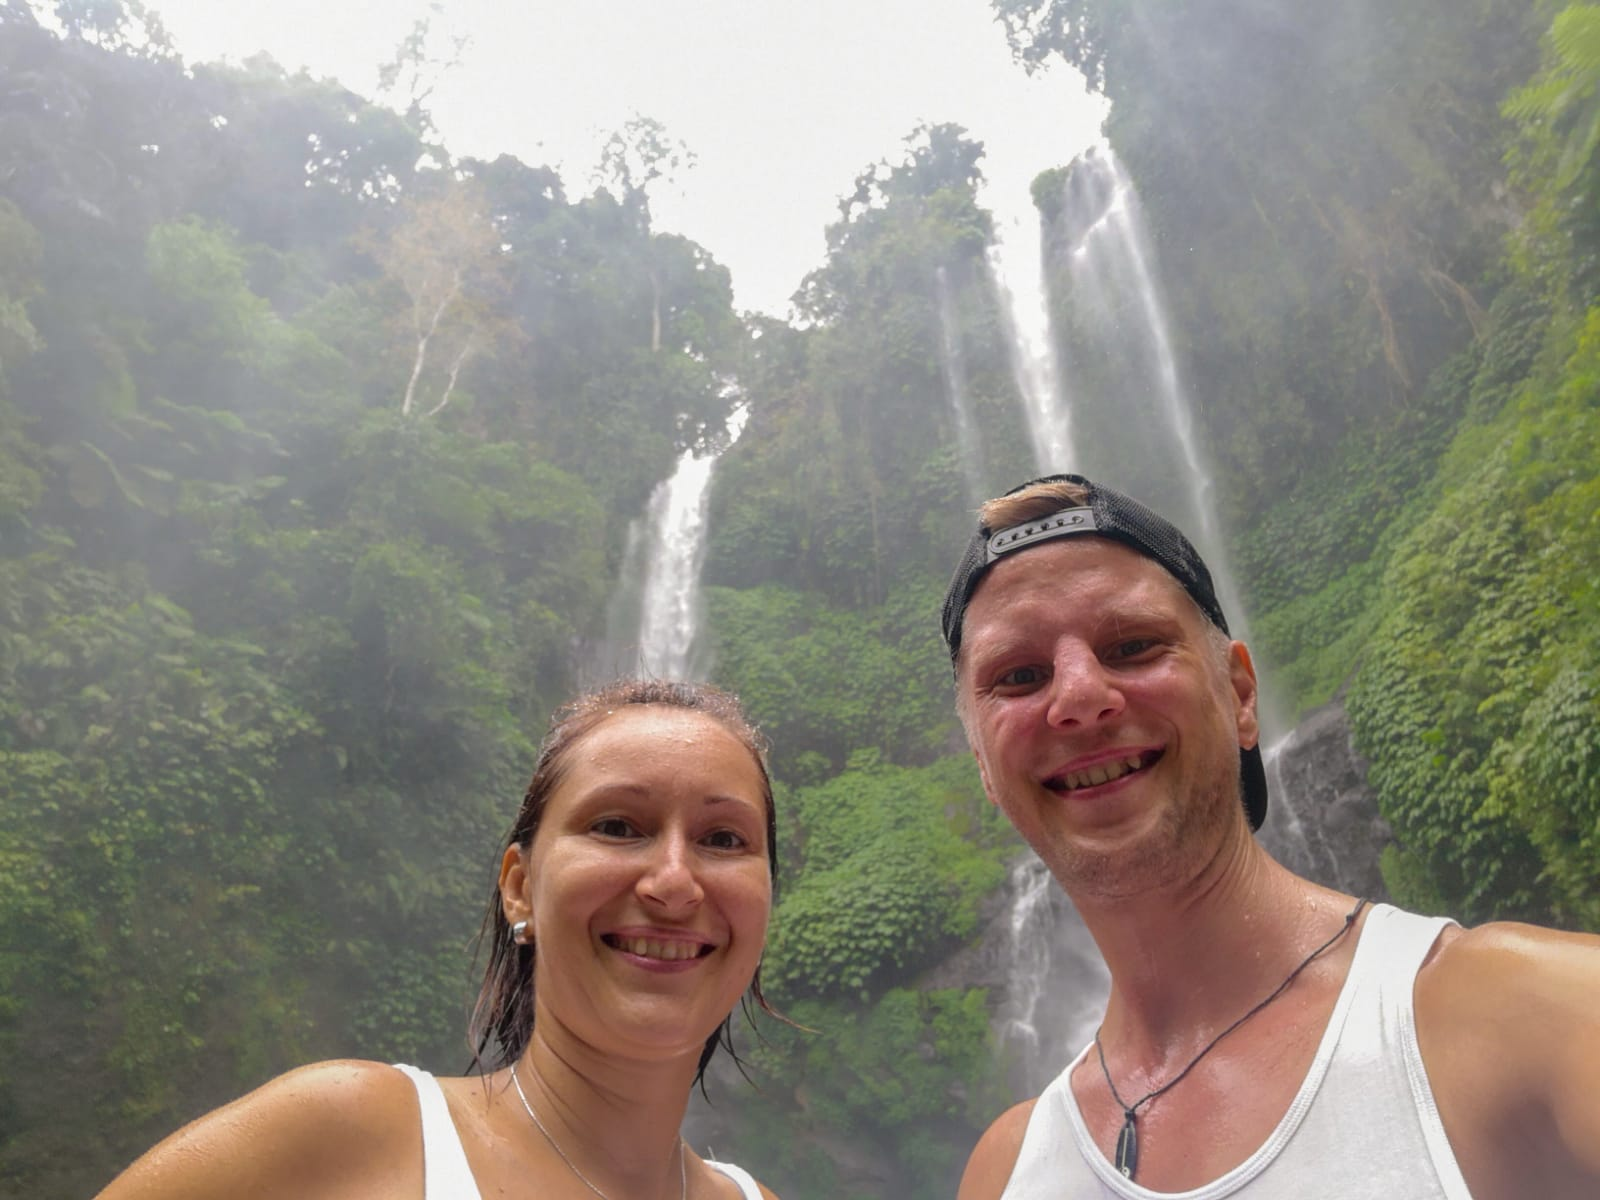 Freshening up in waterfalls